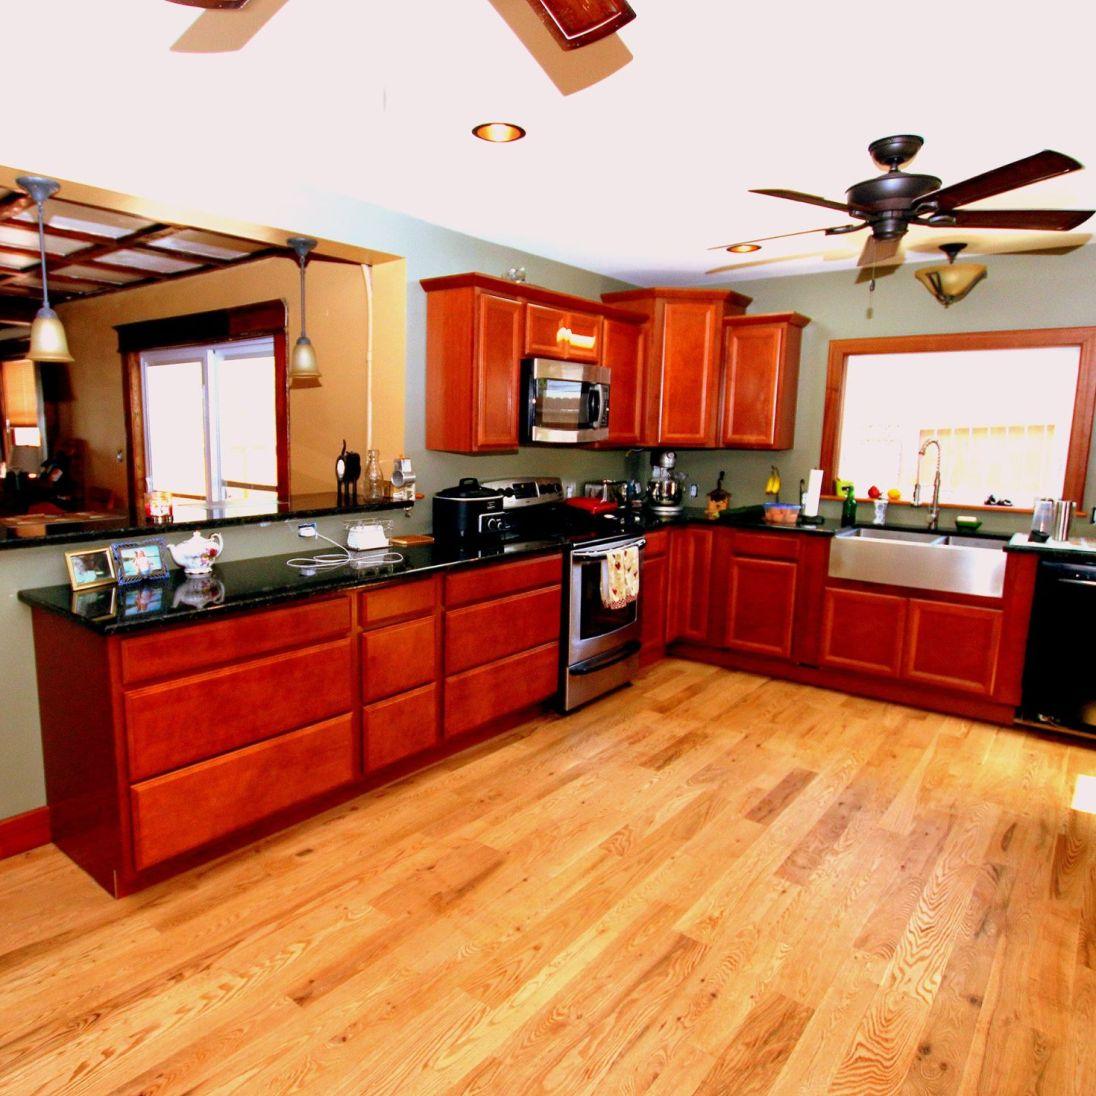 Traverse-City-Hardwood-Floors-Character-Grade-White-Oak-Kitchen-Remodel-01